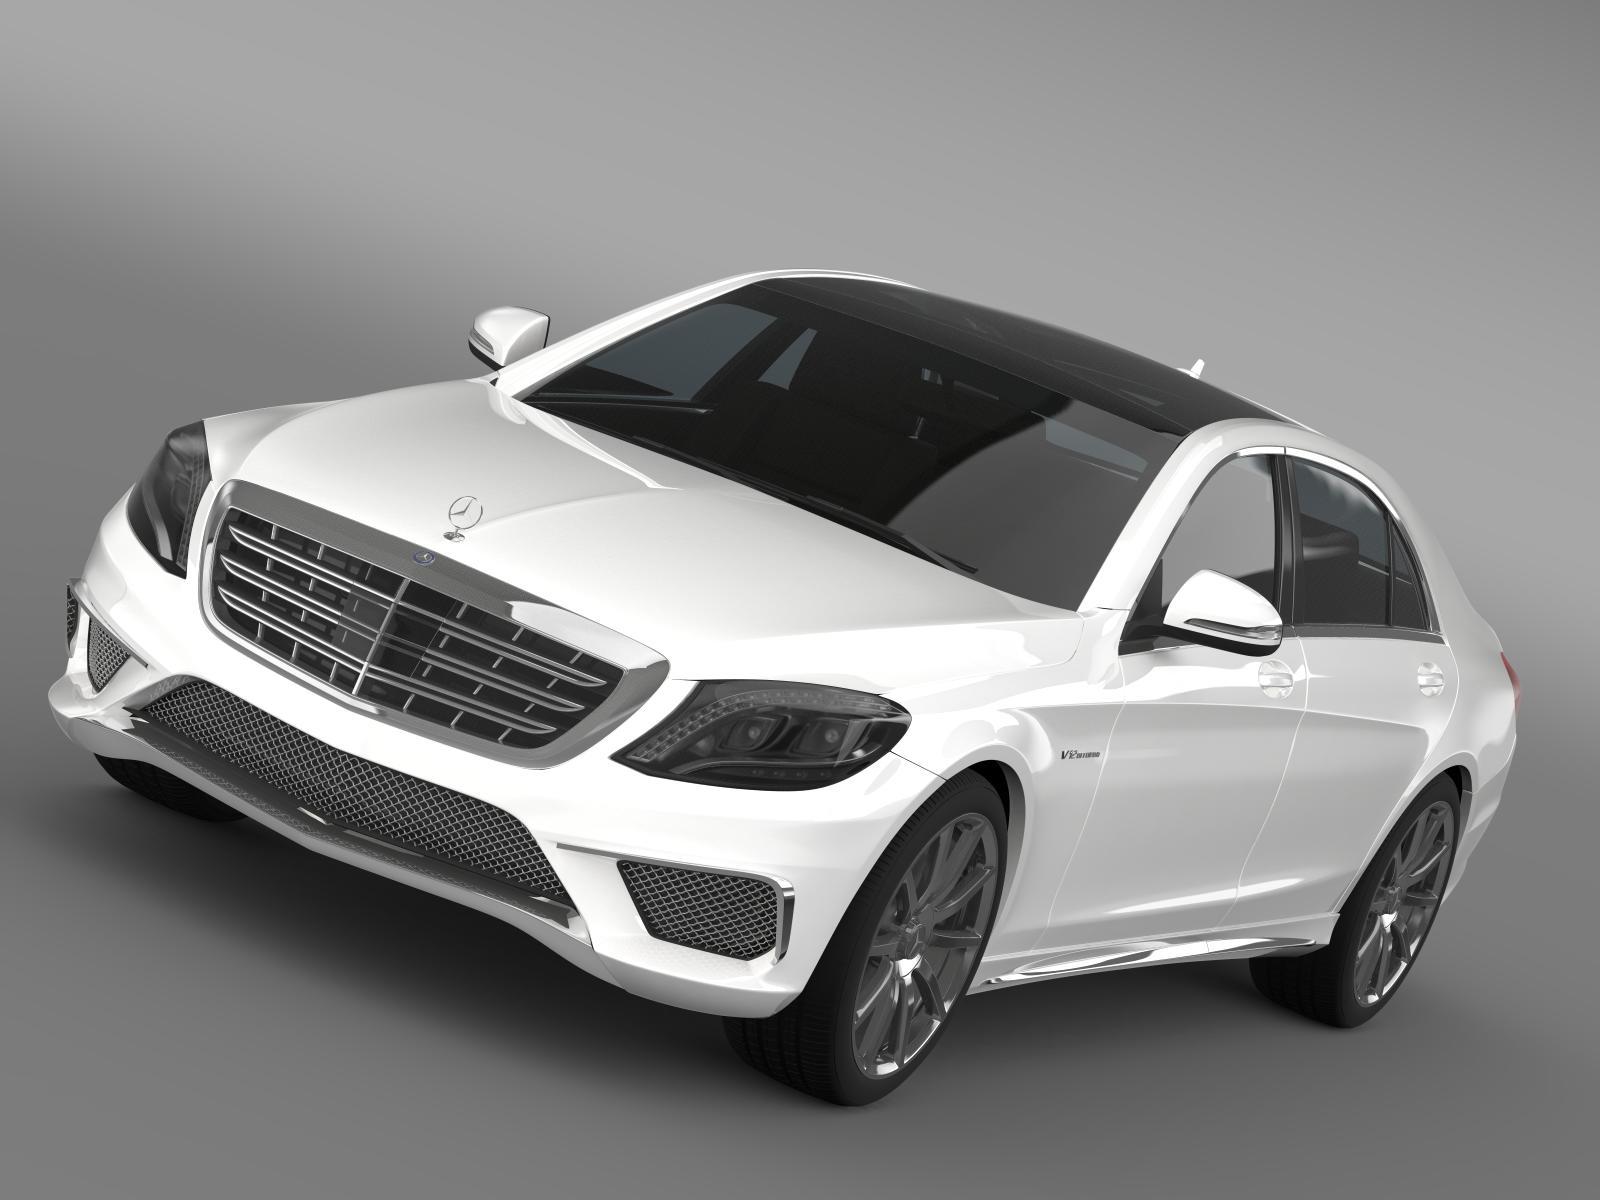 Mercedes benz s 65 amg w222 2014 3d model for Mercedes benz 65 amg